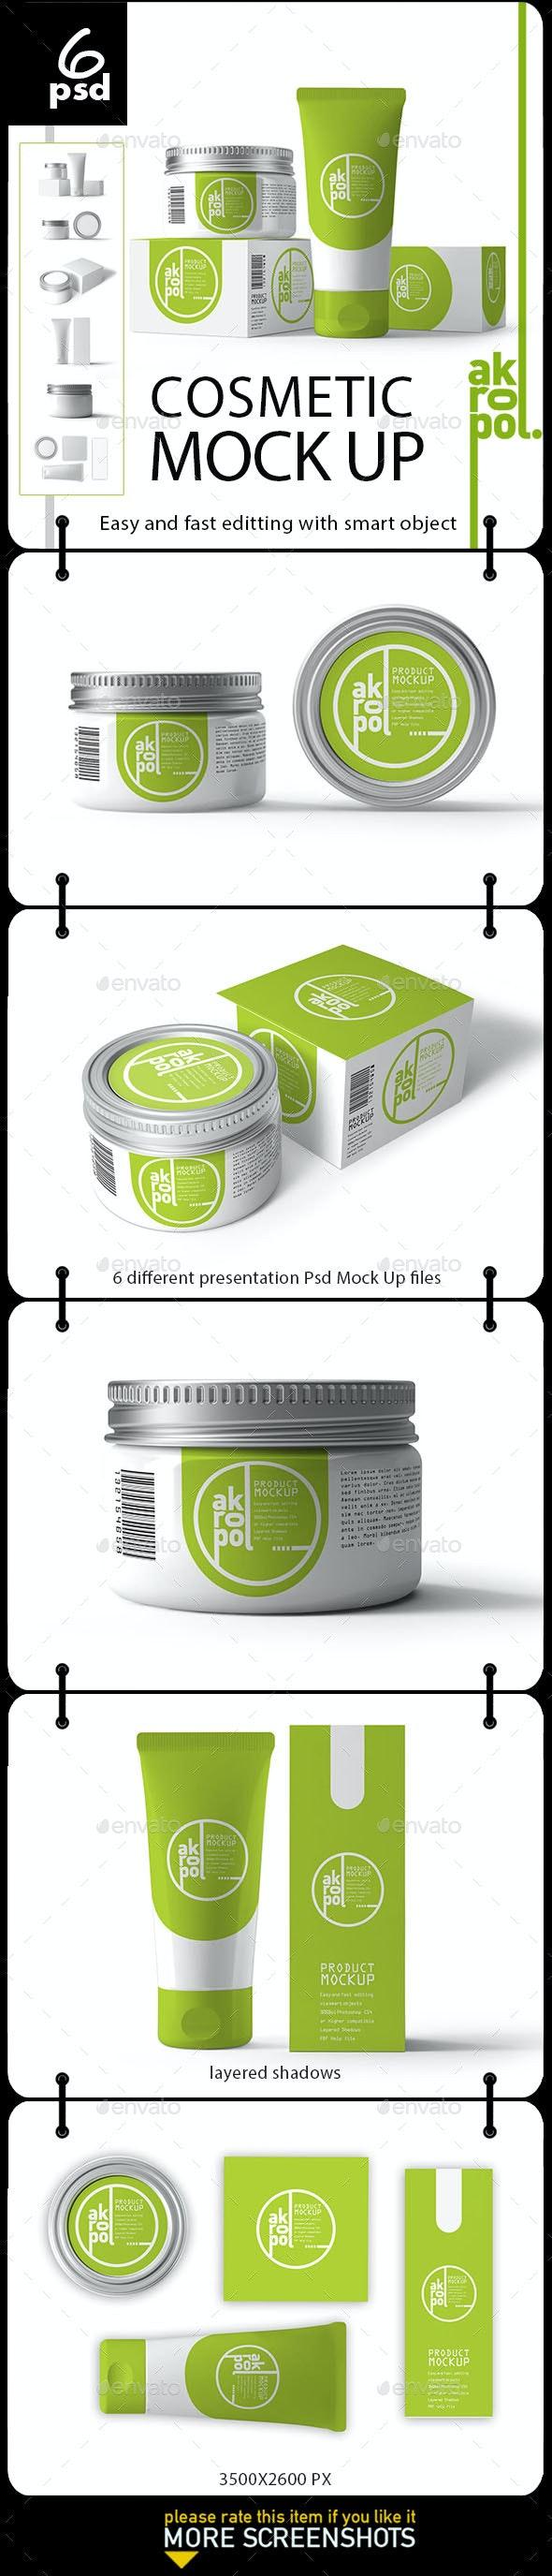 Cosmetic Mock Up - Product Mock-Ups Graphics